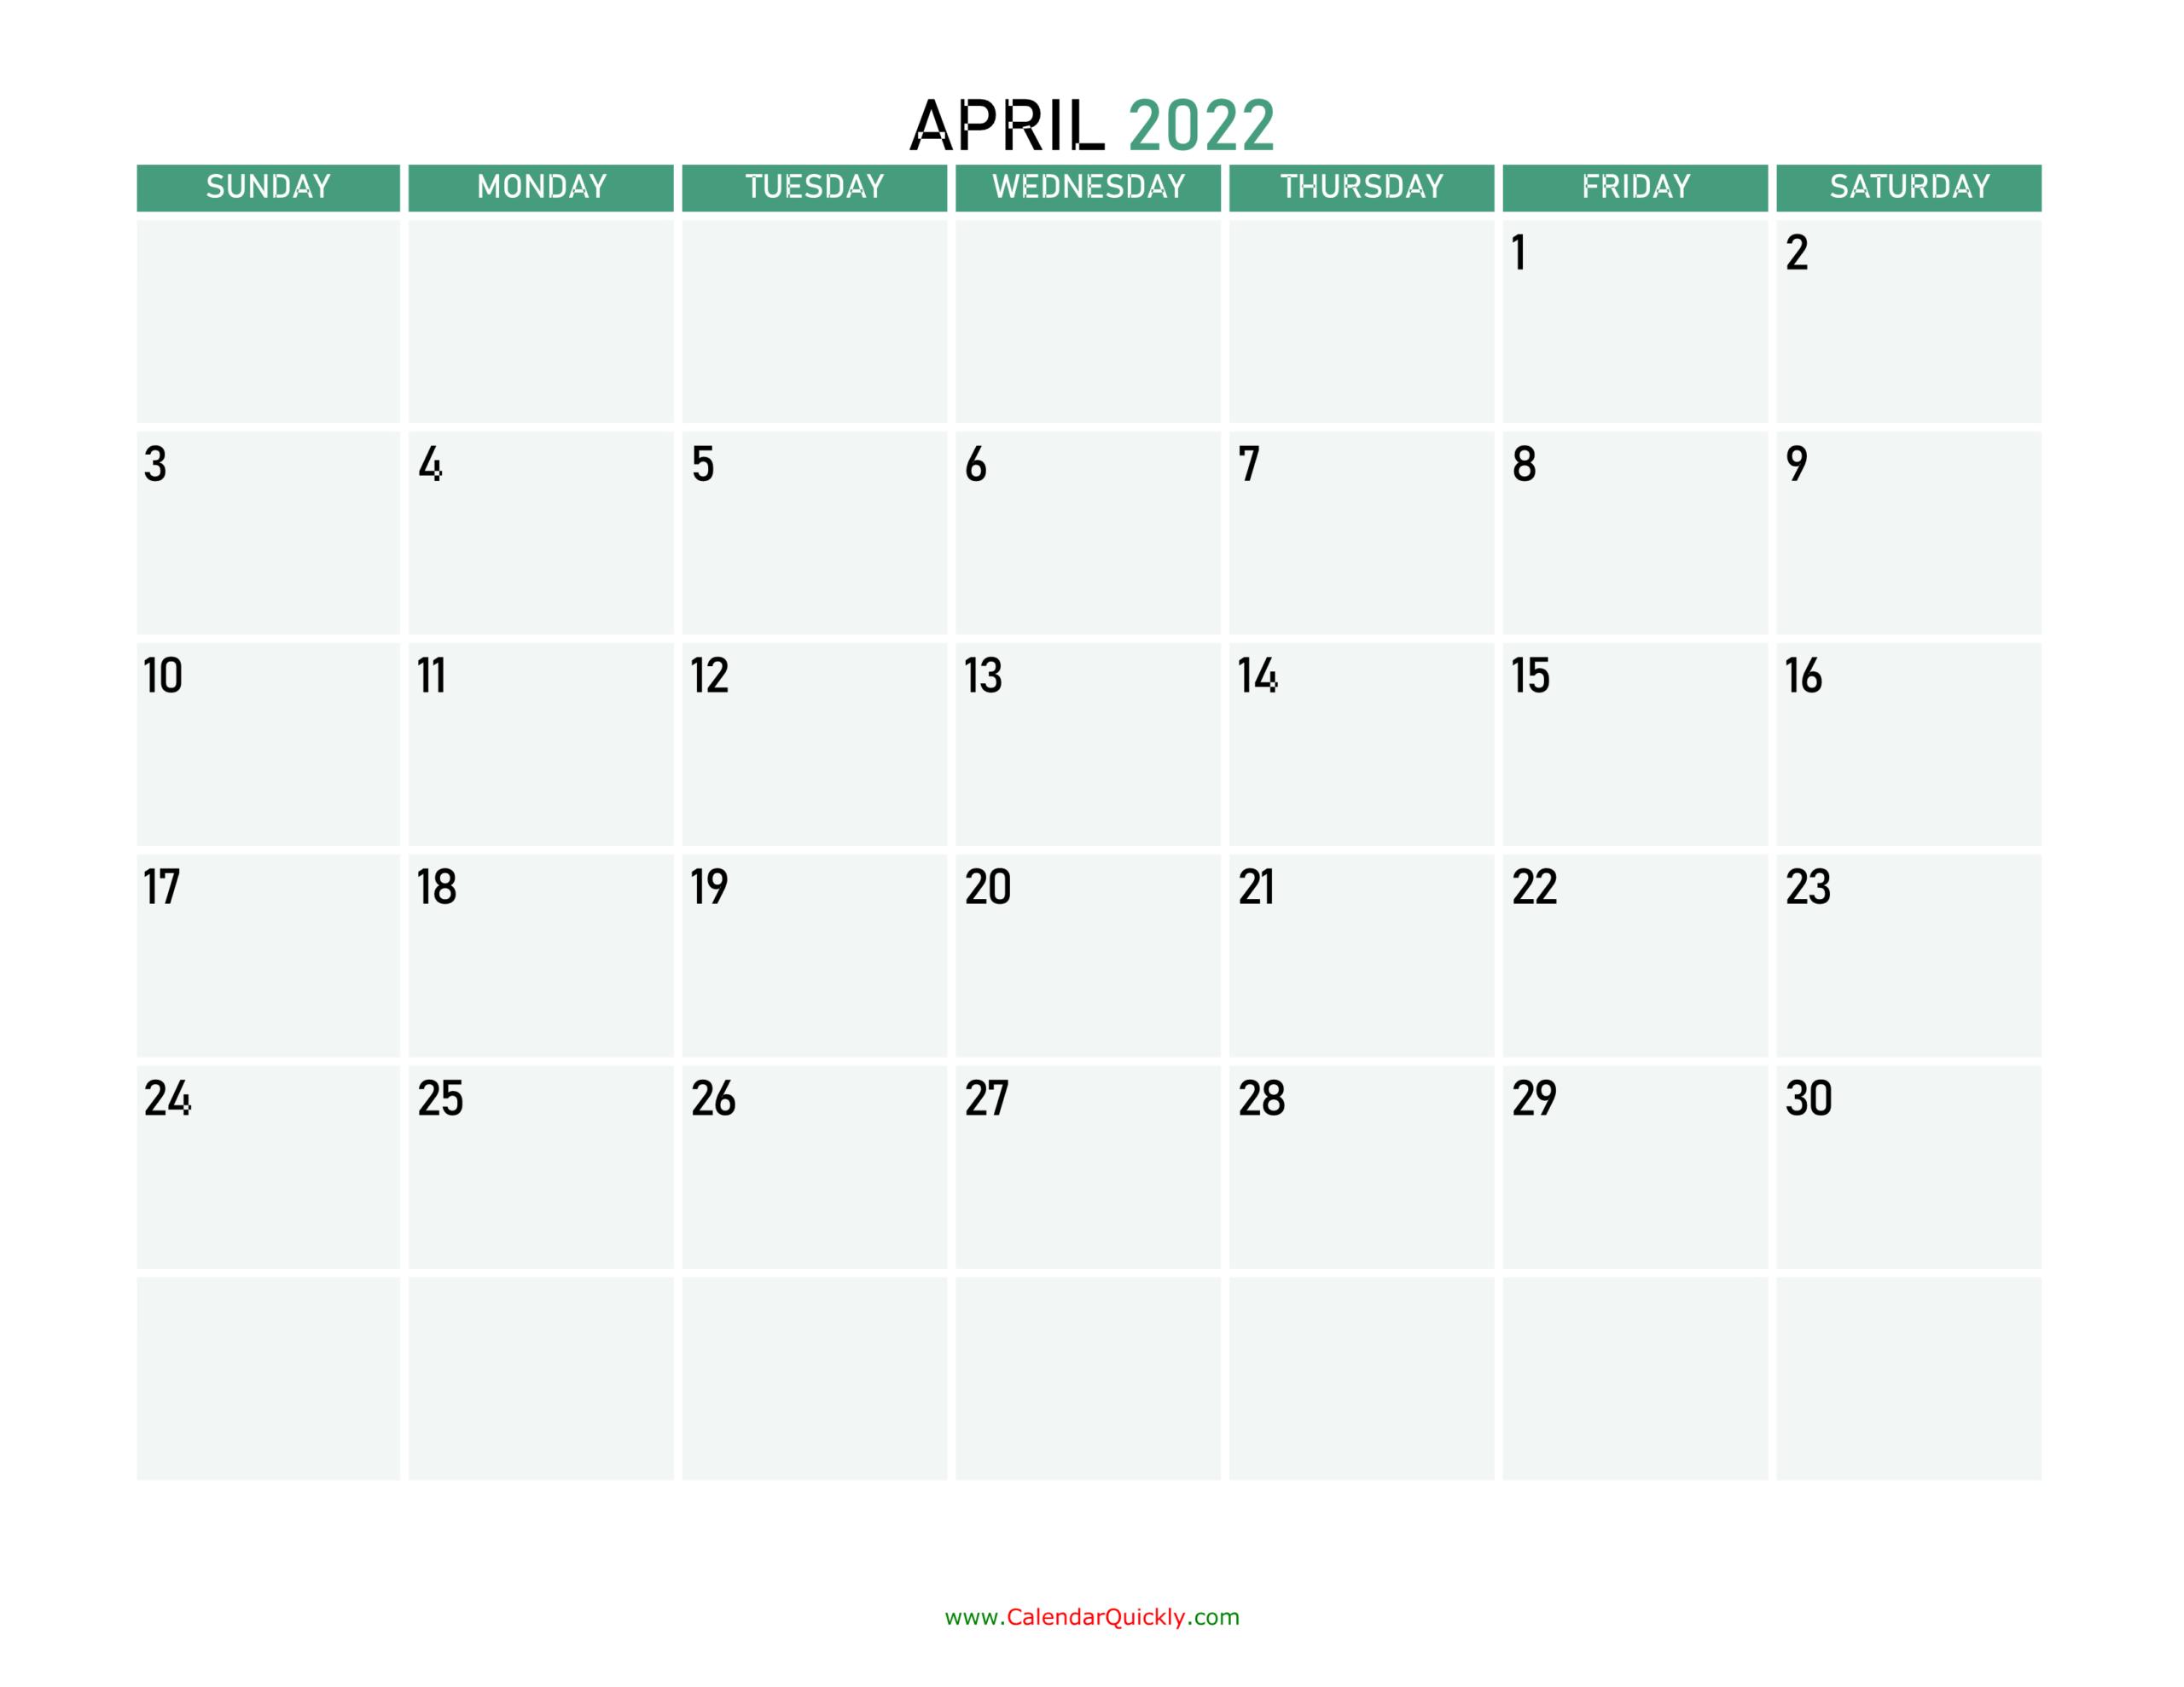 April 2022 Calendars | Calendar Quickly pertaining to March & April 2022 Calendar Free Printable